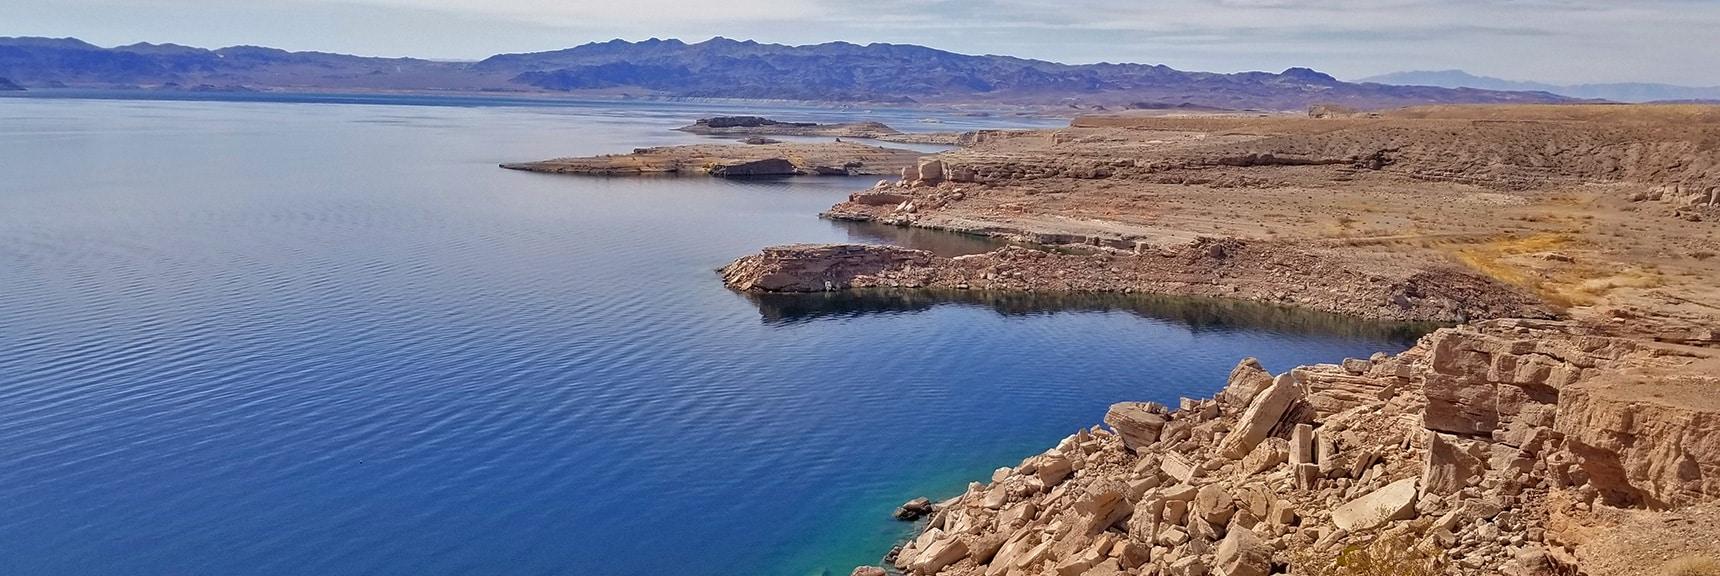 Lake Mead Shoreline from Callville Summit   Callville Summit Trail   Lake Mead National Recreation Area, Nevada